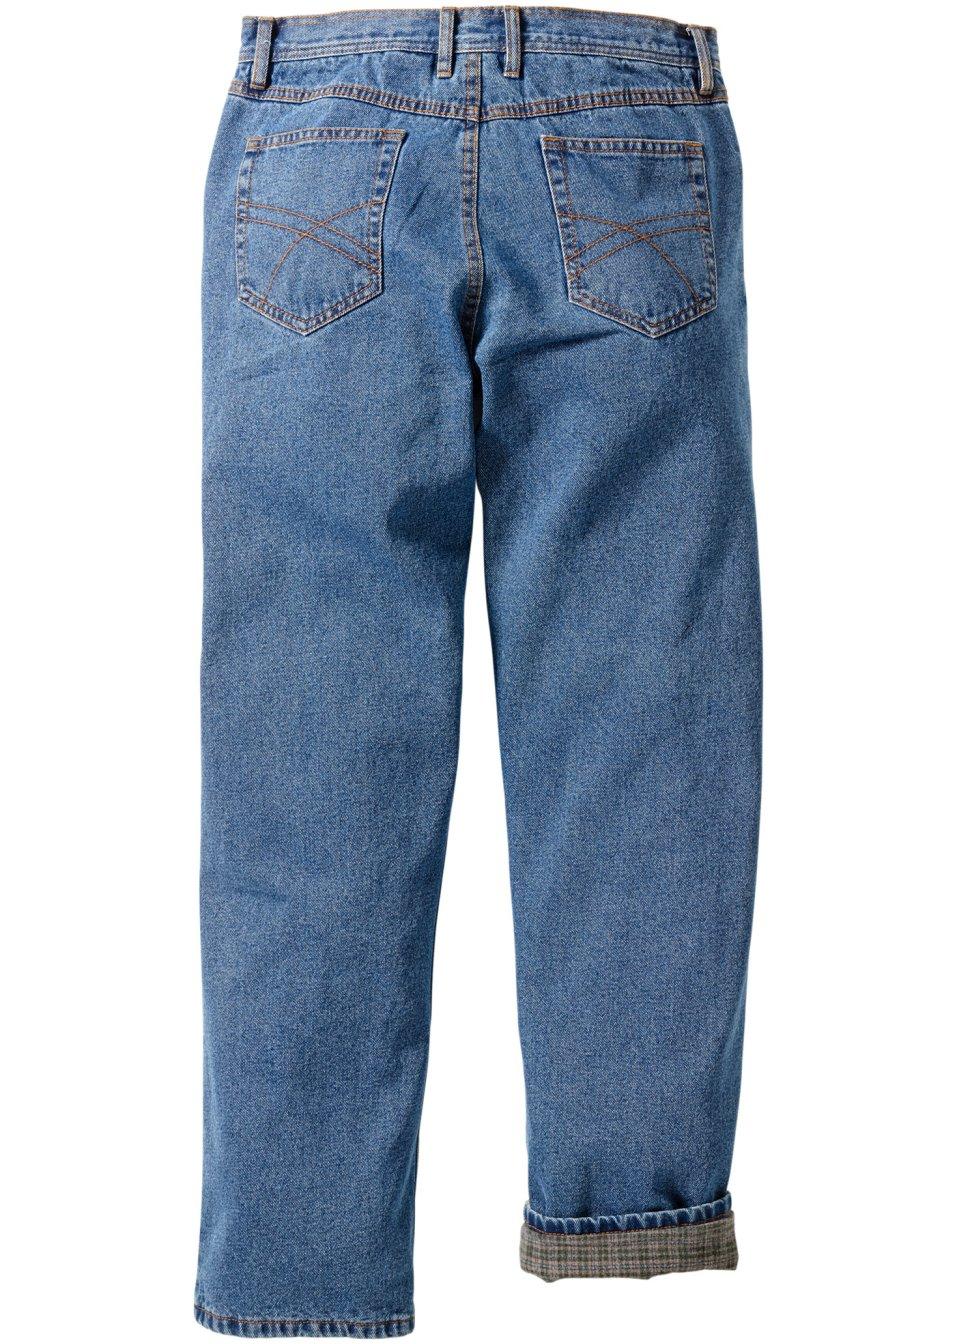 thermo jeans f r herren mit weichem flanellfutter blau u s gr e. Black Bedroom Furniture Sets. Home Design Ideas